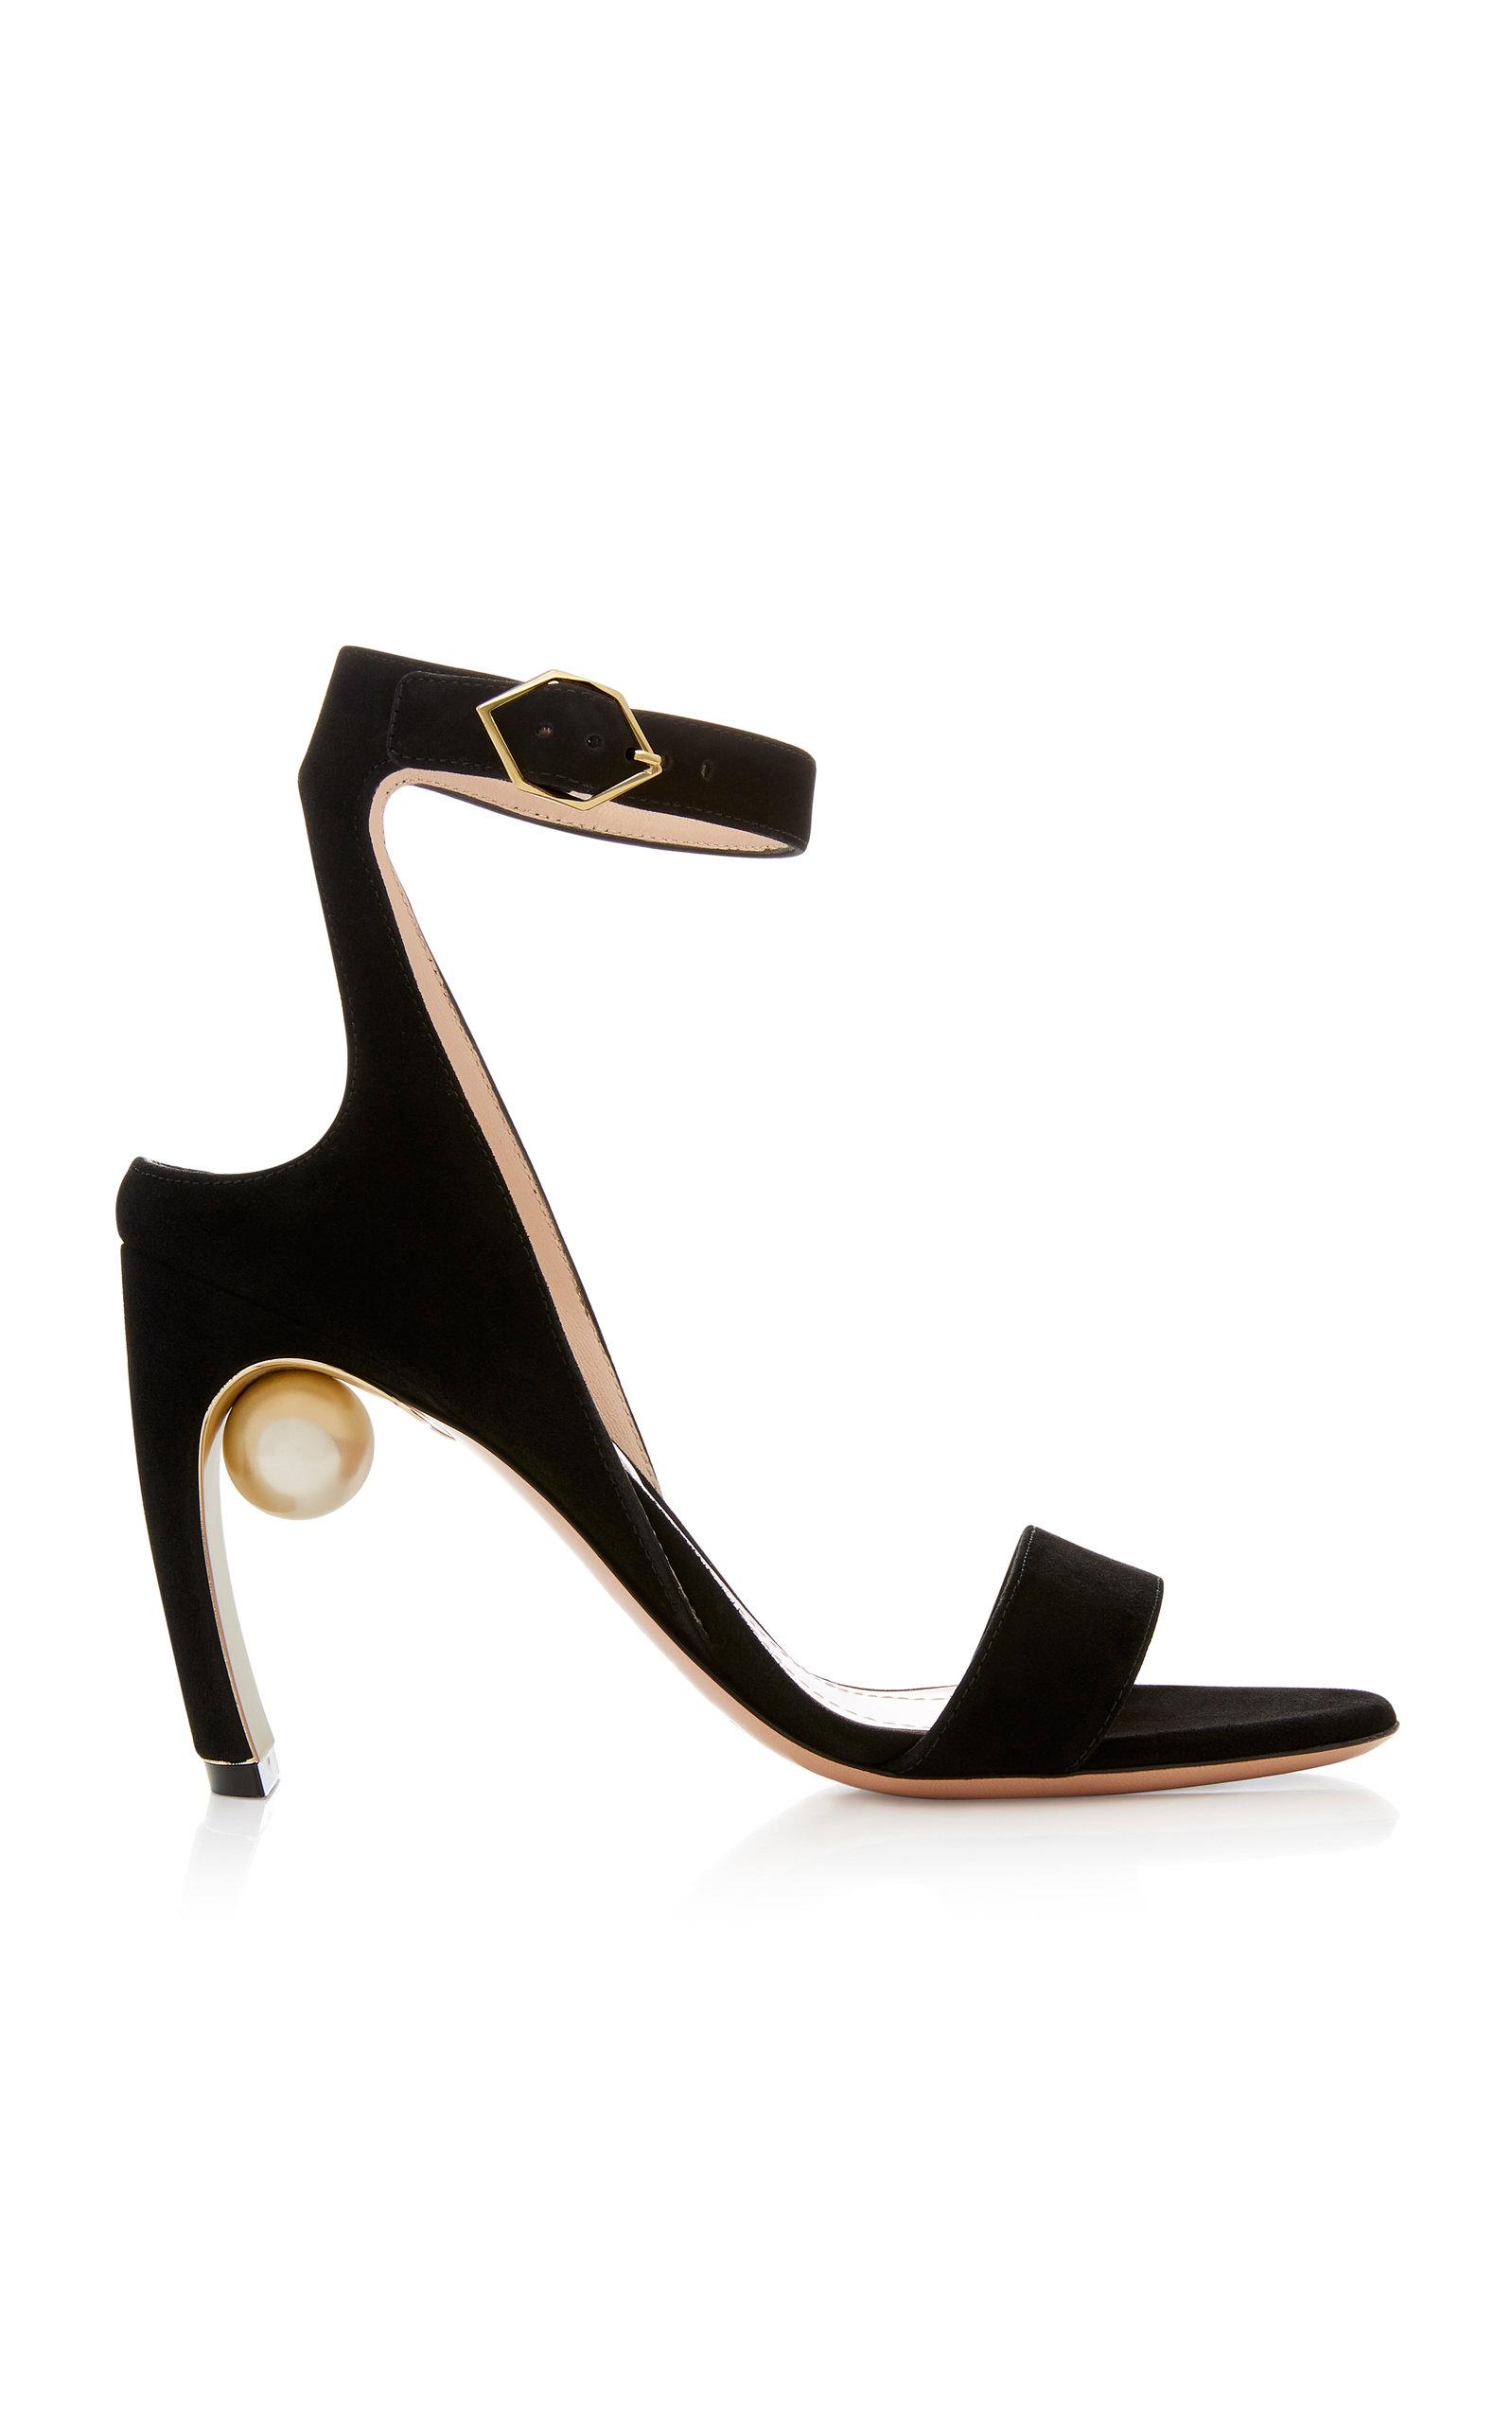 Nicholas Kirkwood Lola Metallic Leather Pearl Sandals Gr. IT 41 MxvJCV